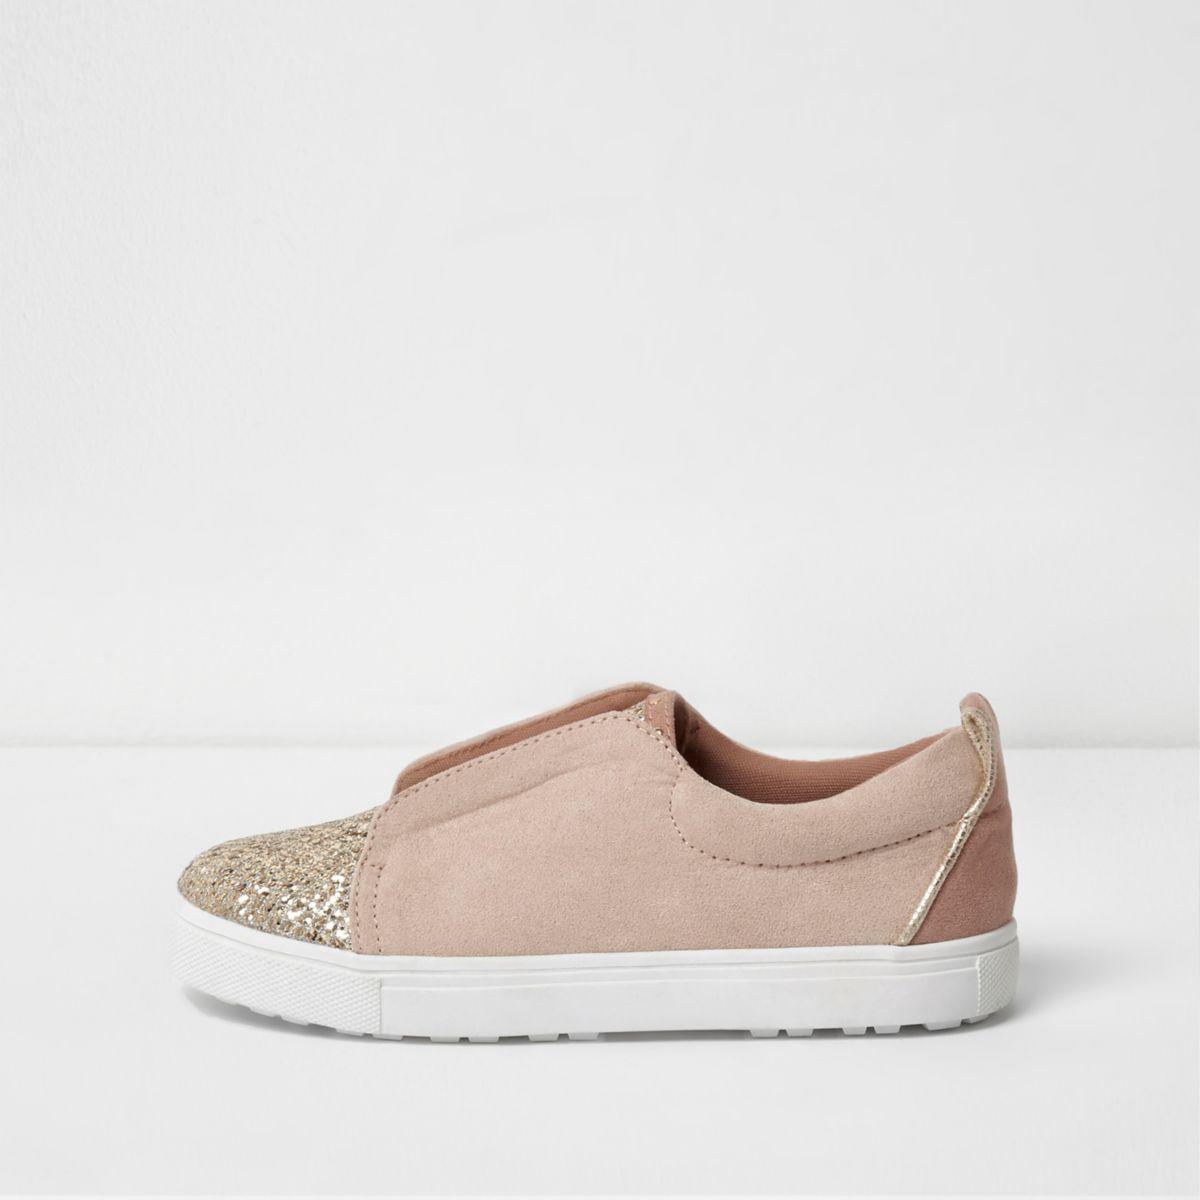 Girls pink glitter studded slip on plimsolls